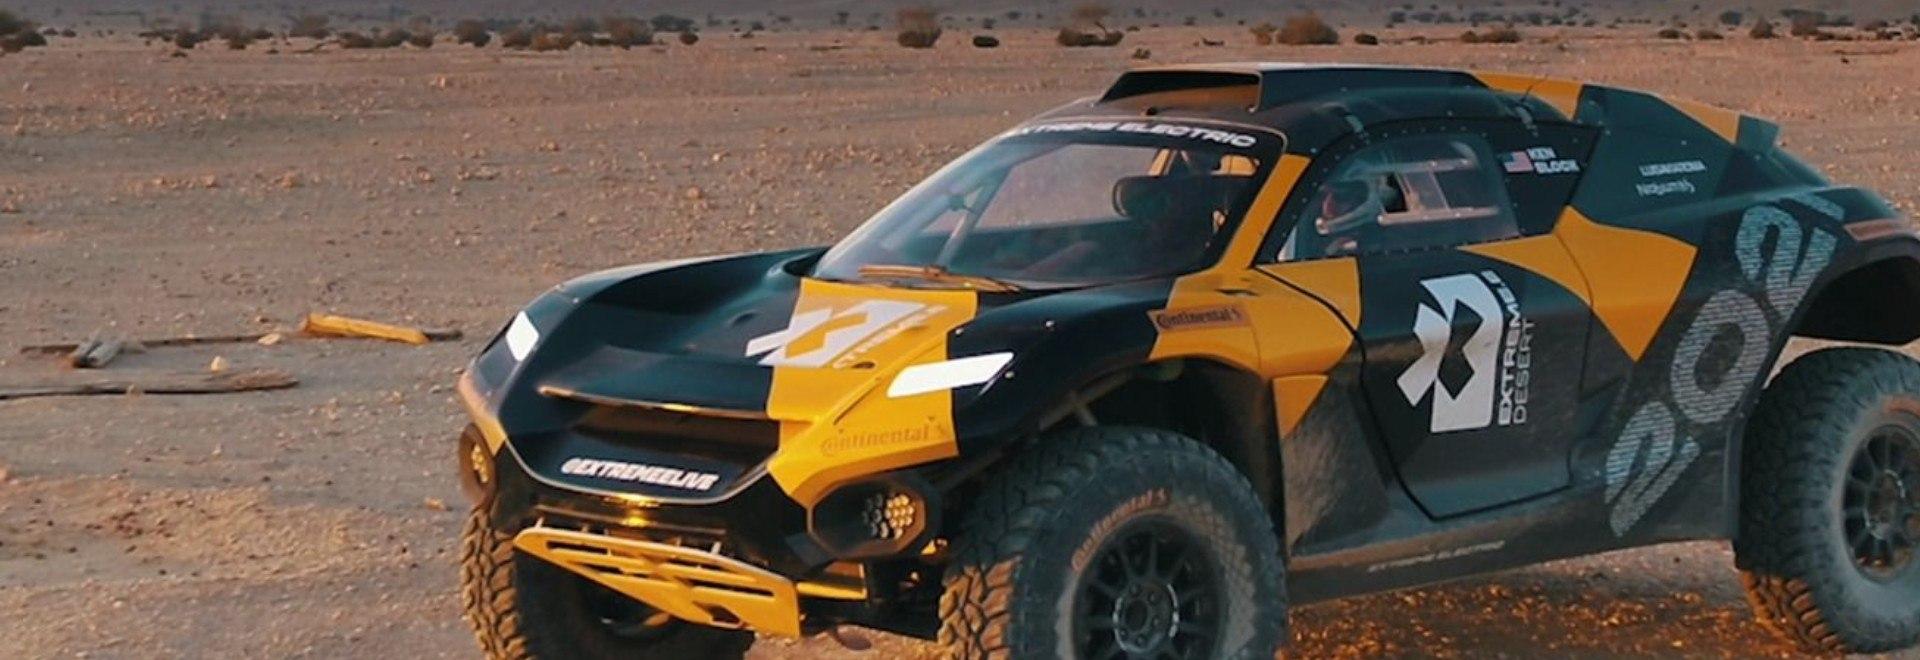 Desert X-Prix. Arabia Saudita. Anteprima